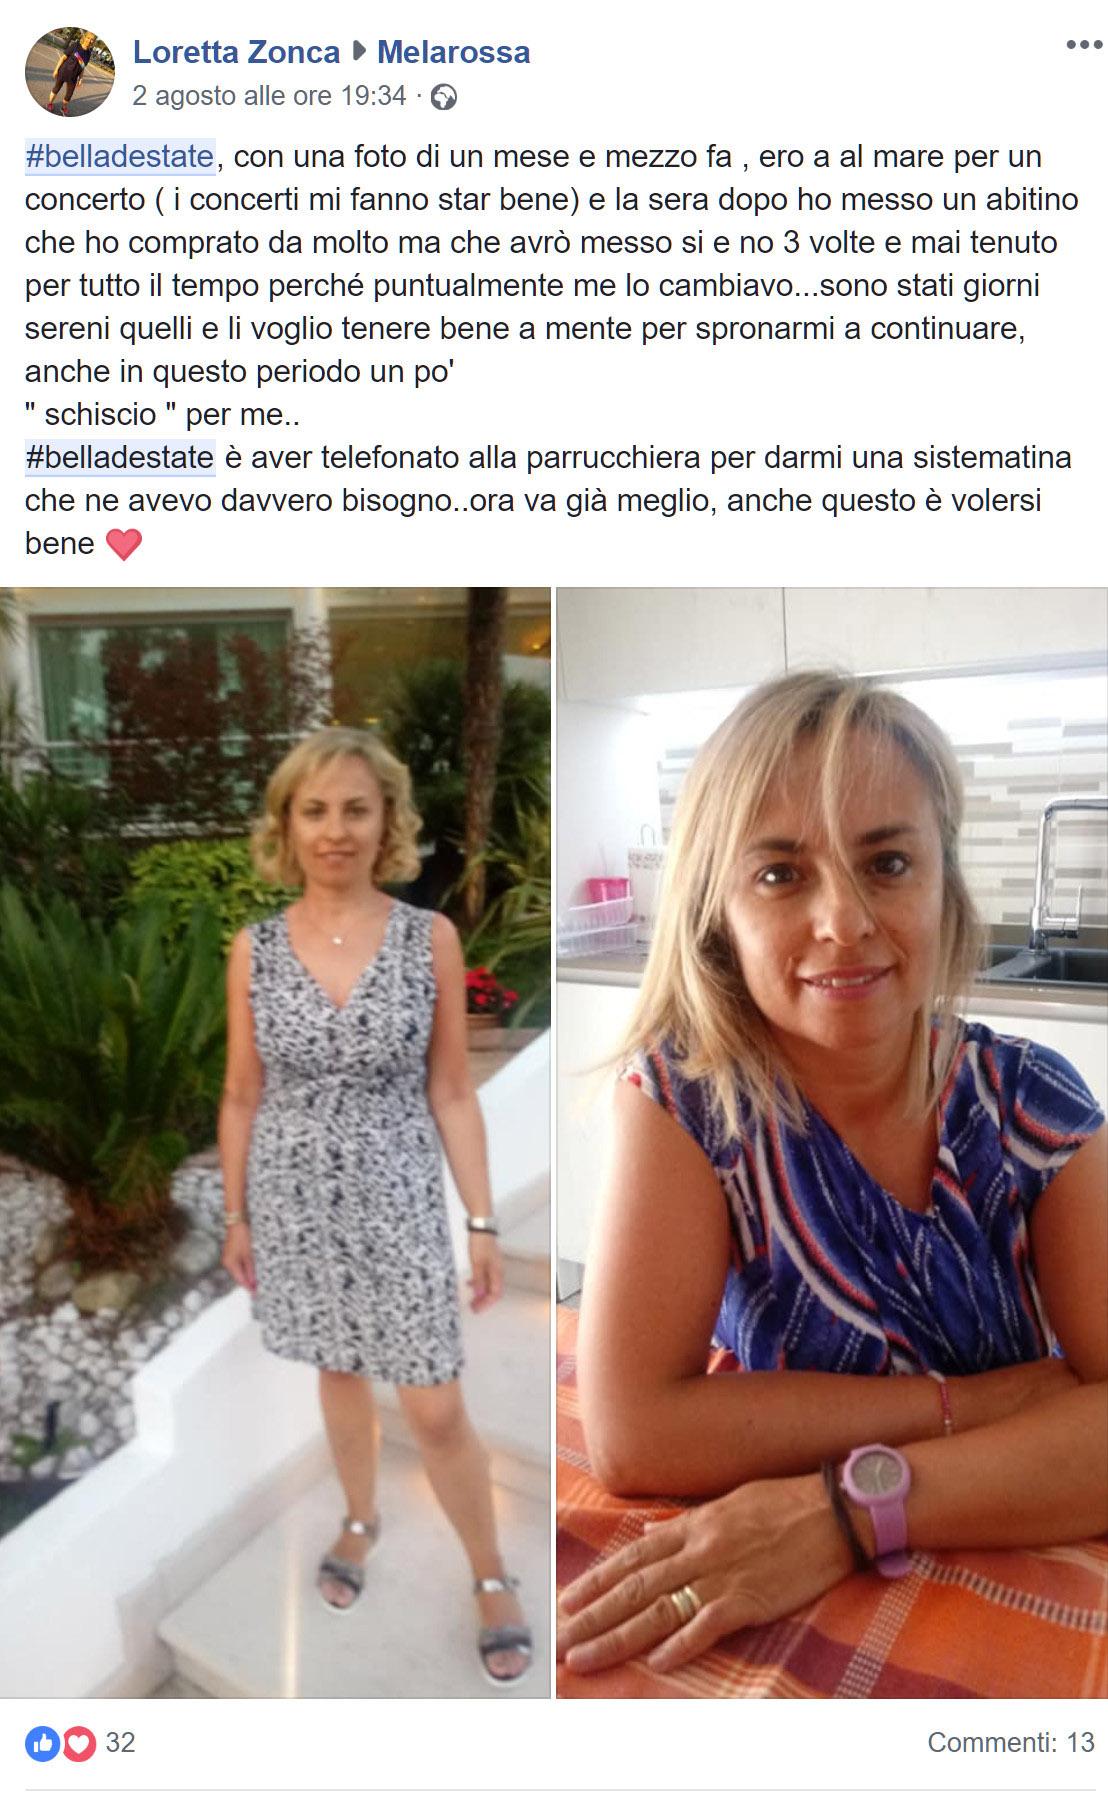 Loretta Zonca #belladestate Melarossa